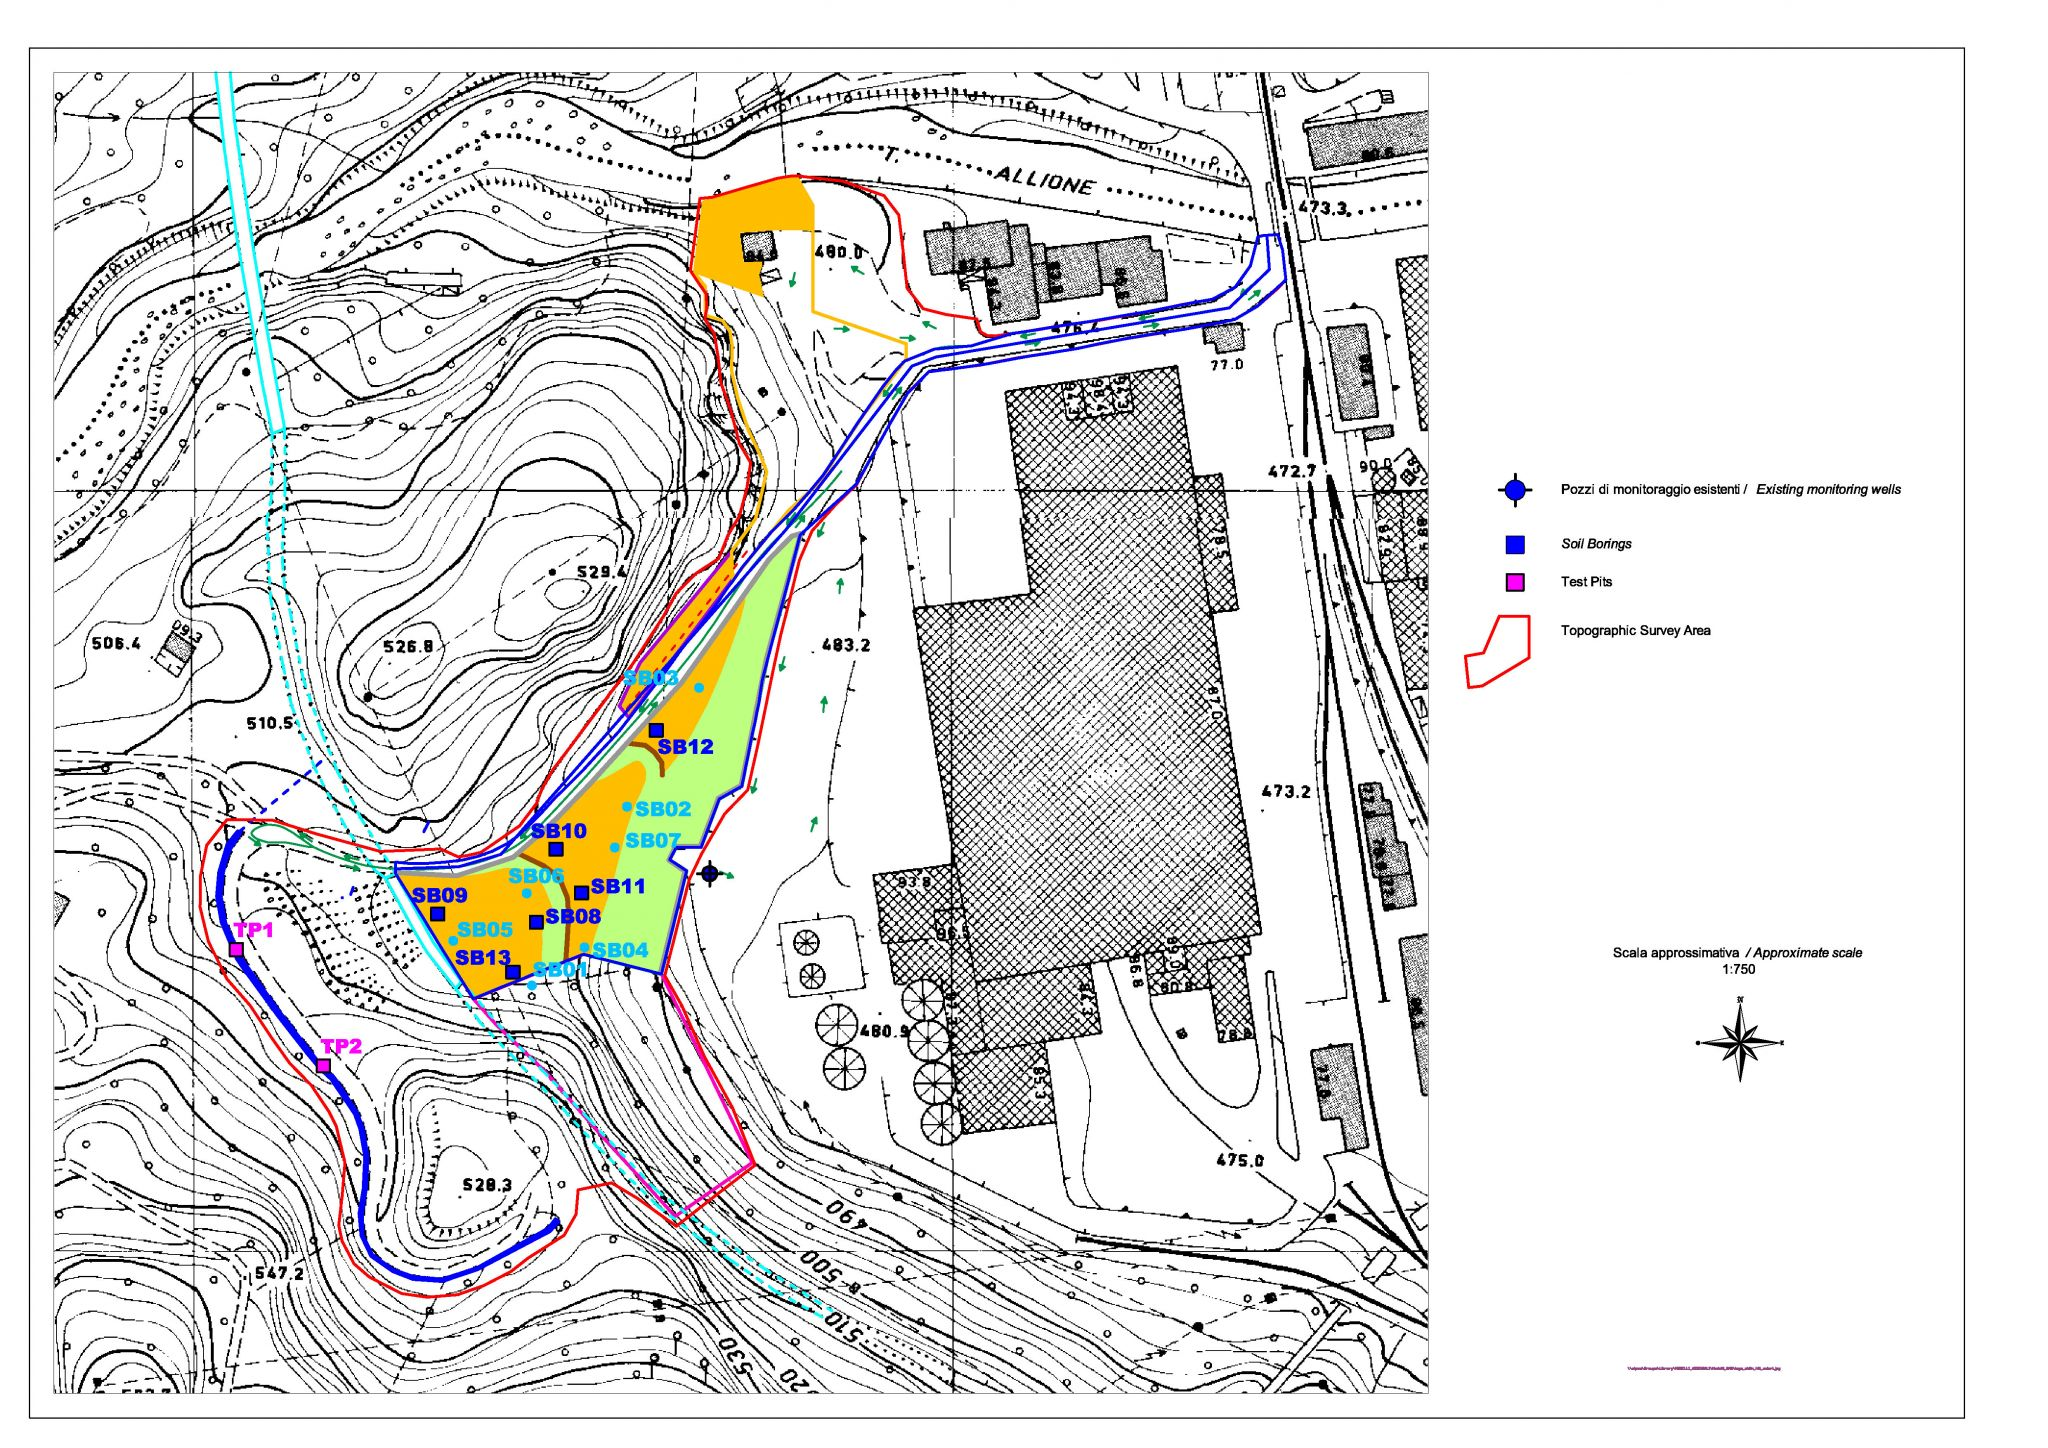 tethys -consulenza ambientale e idrogeologica - messa in sicurezza discarica industriale zona montana